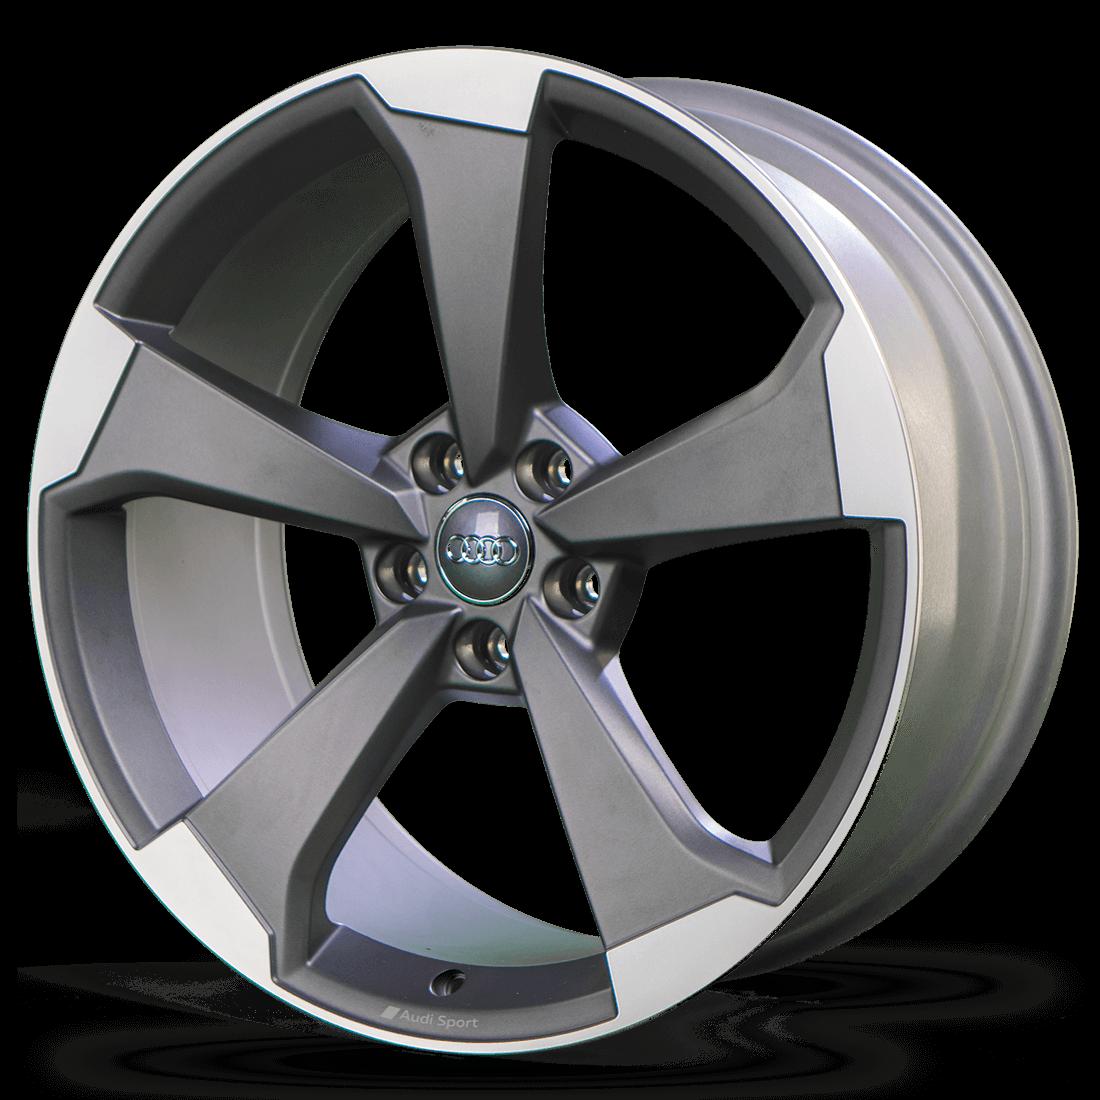 4x Audi 20 Inch Rims A5 S5 8W B9 Alloy Rims Rotor 8W0601025CF S line NEW